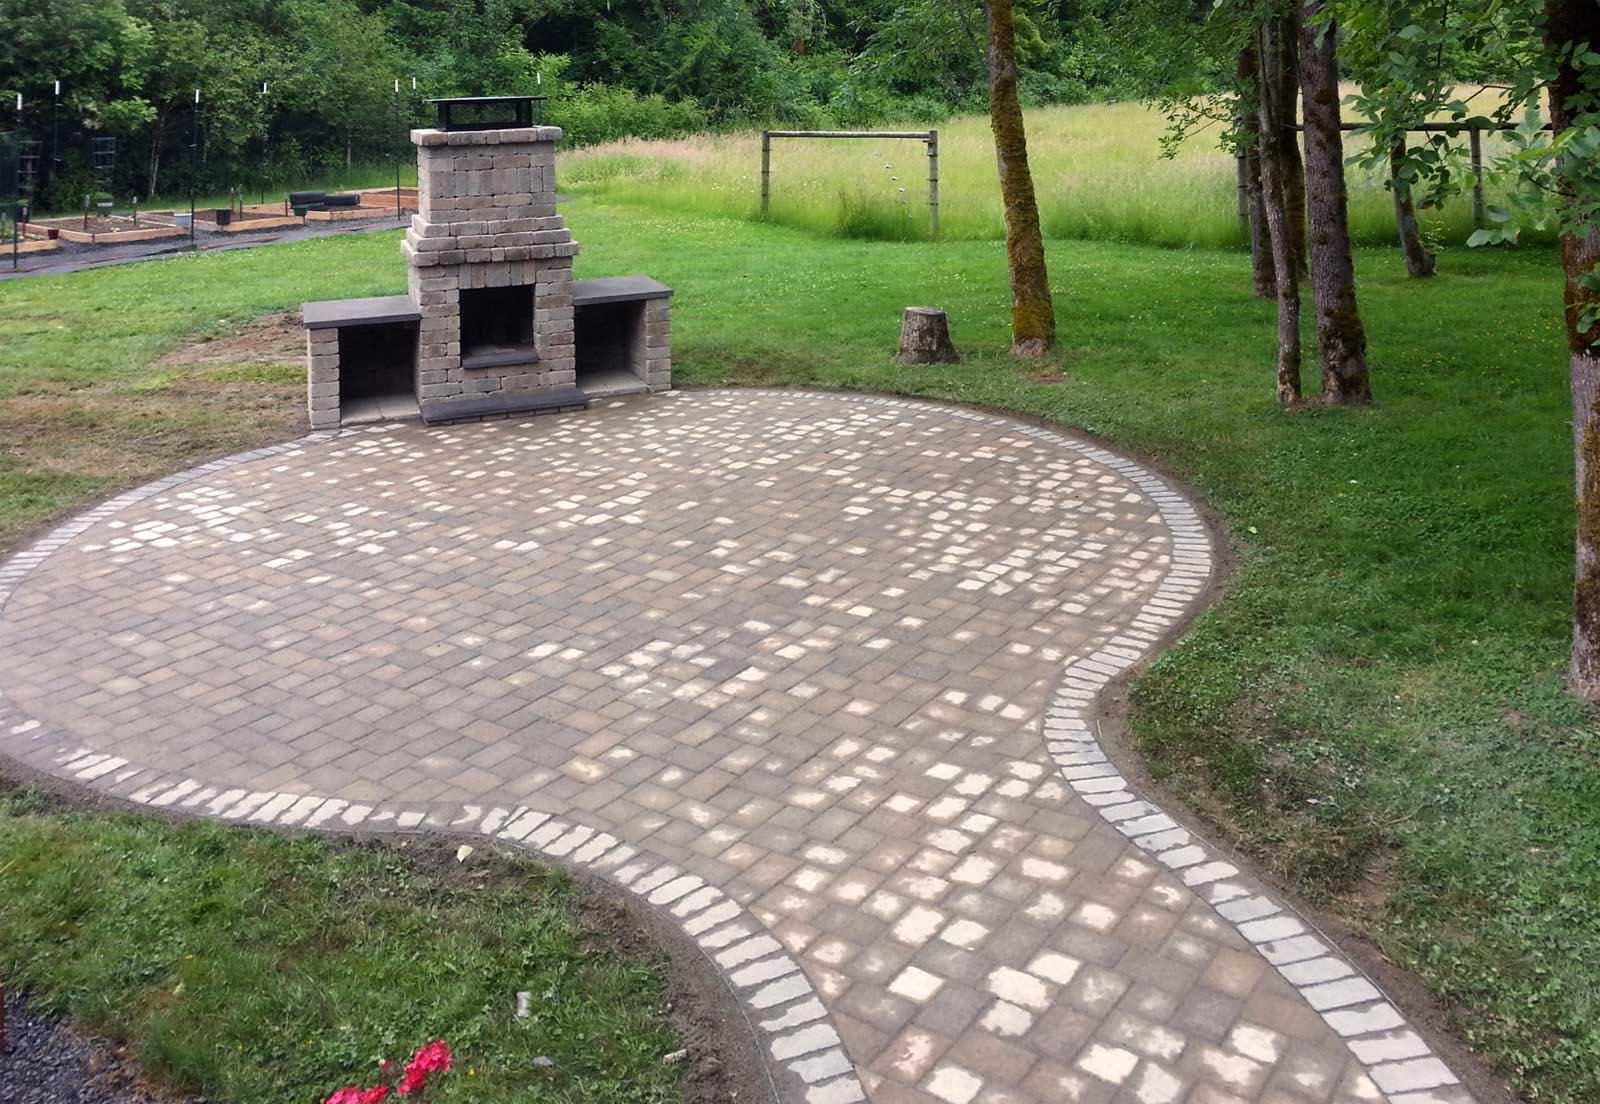 Brick Paver Fire Pit   Fire Pit Design Ideas on Paver Patio With Fire Pit Ideas id=71239